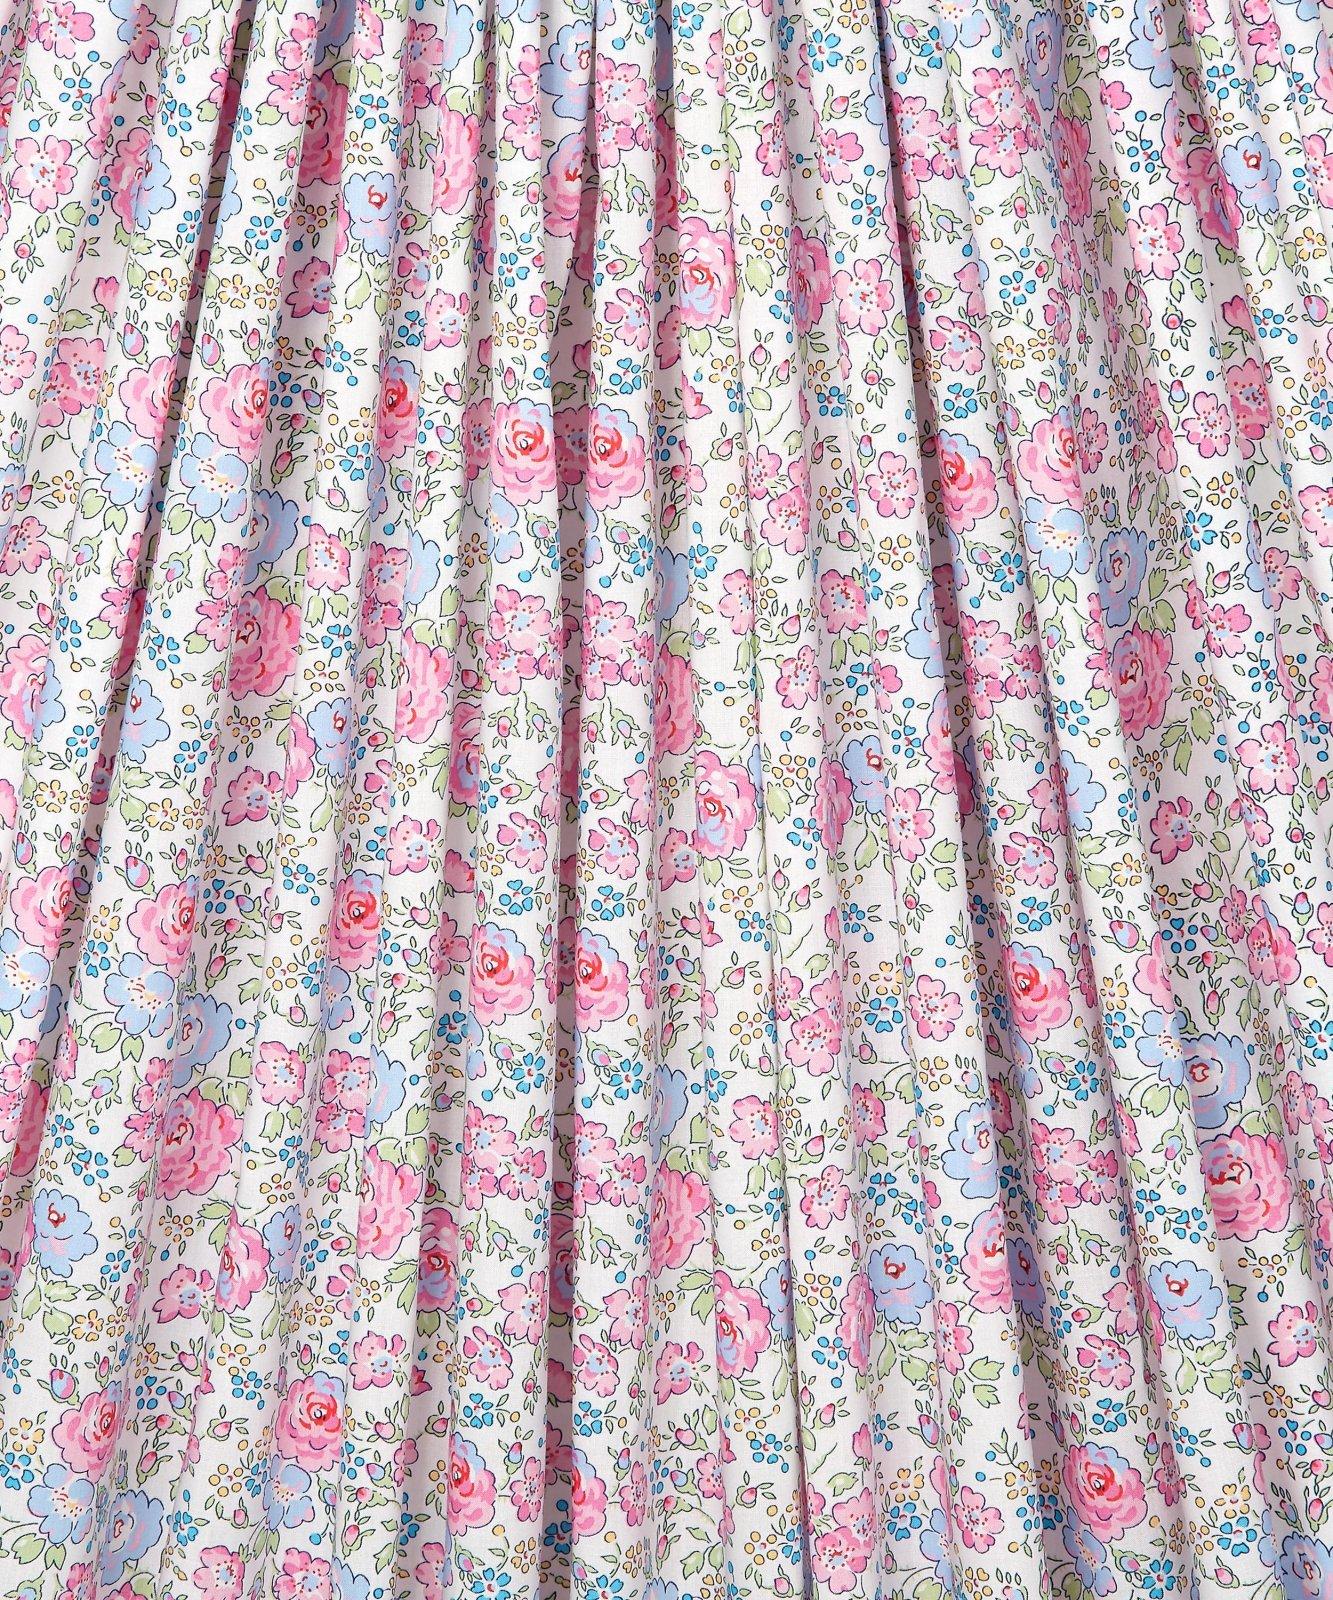 Felicite B Pink Liberty of London Tana Lawn Fabric